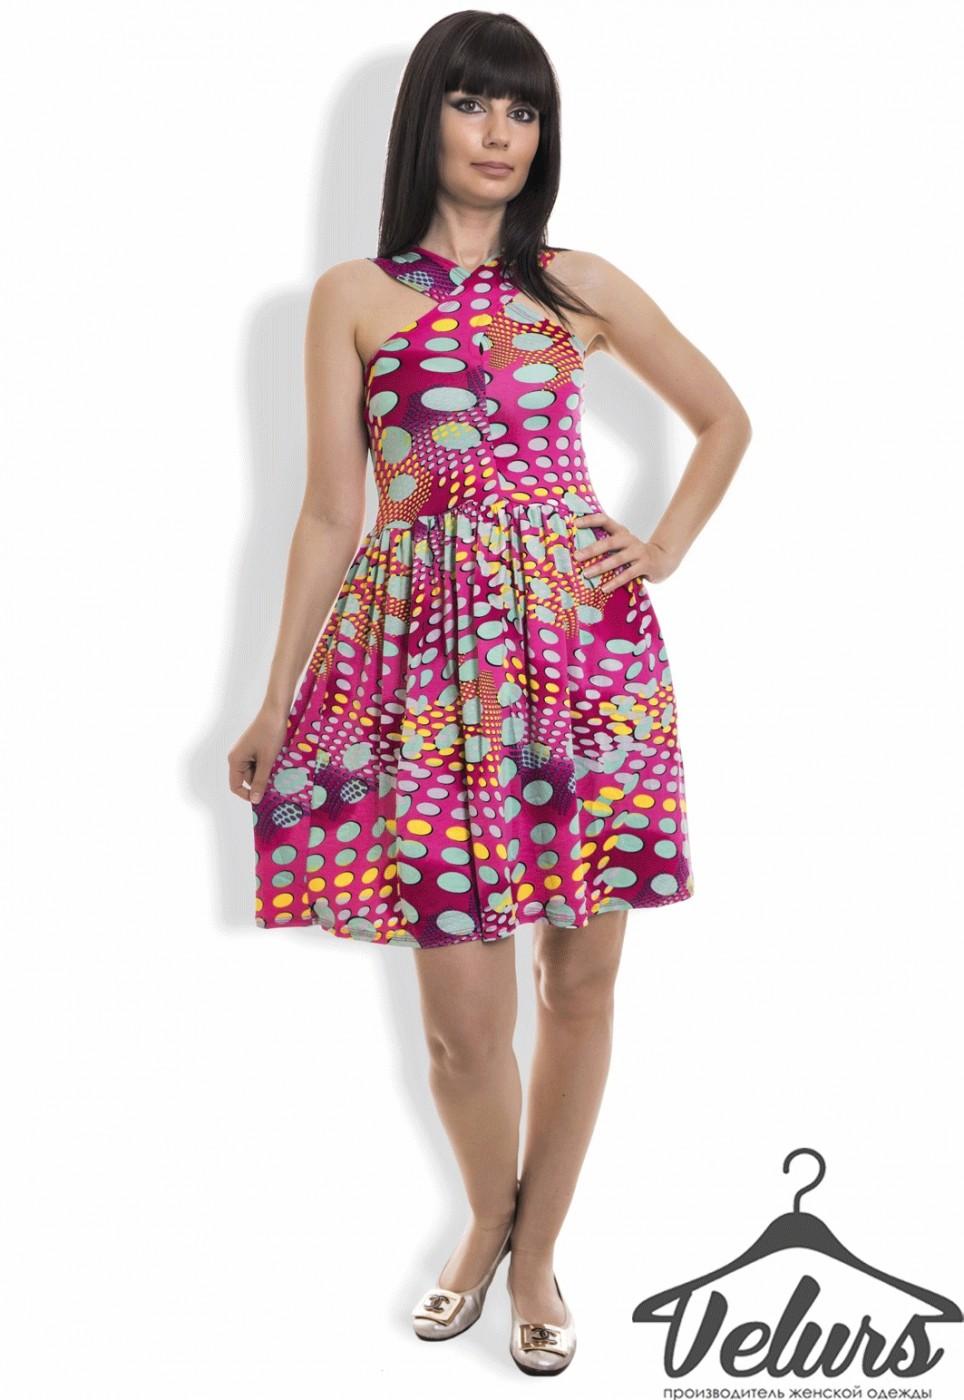 Velurs: Платье 21962 - фото 7